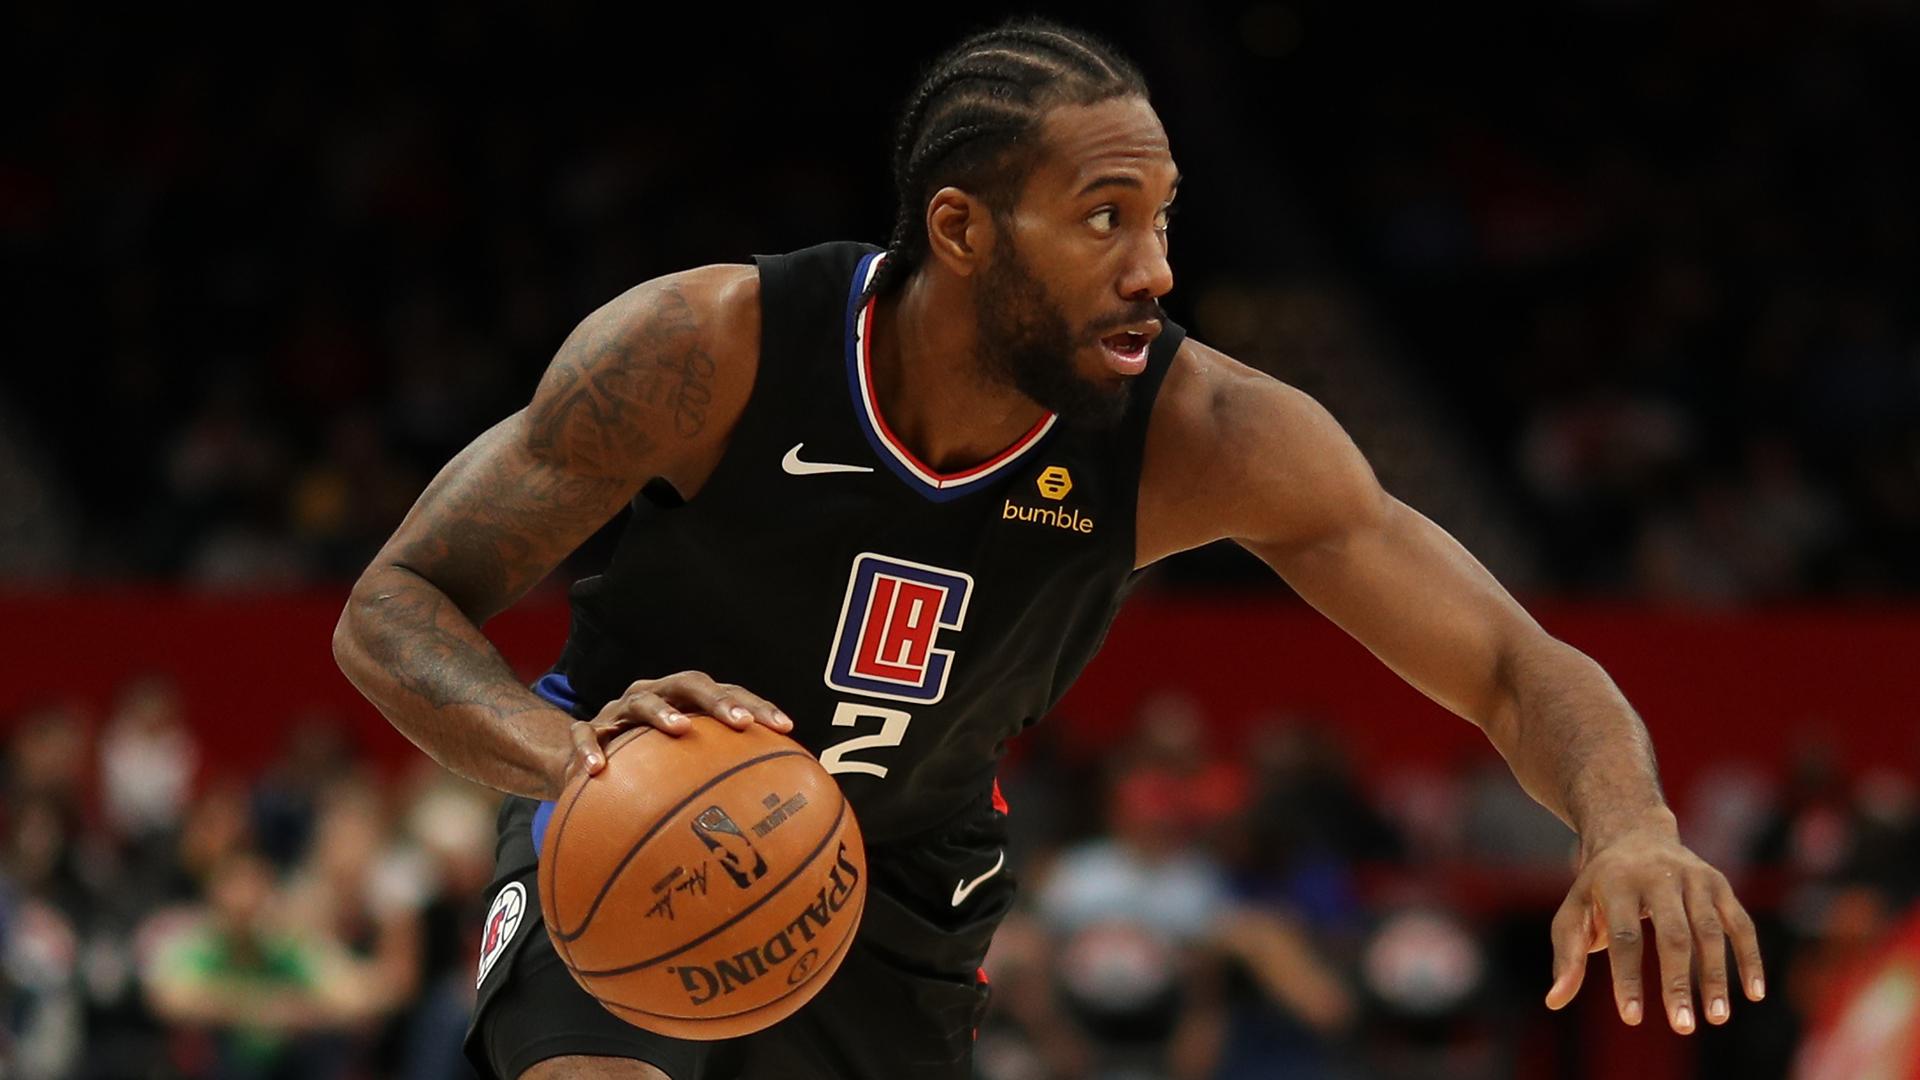 Clippers win in Leonard's Toronto return, Bucks stretch streak